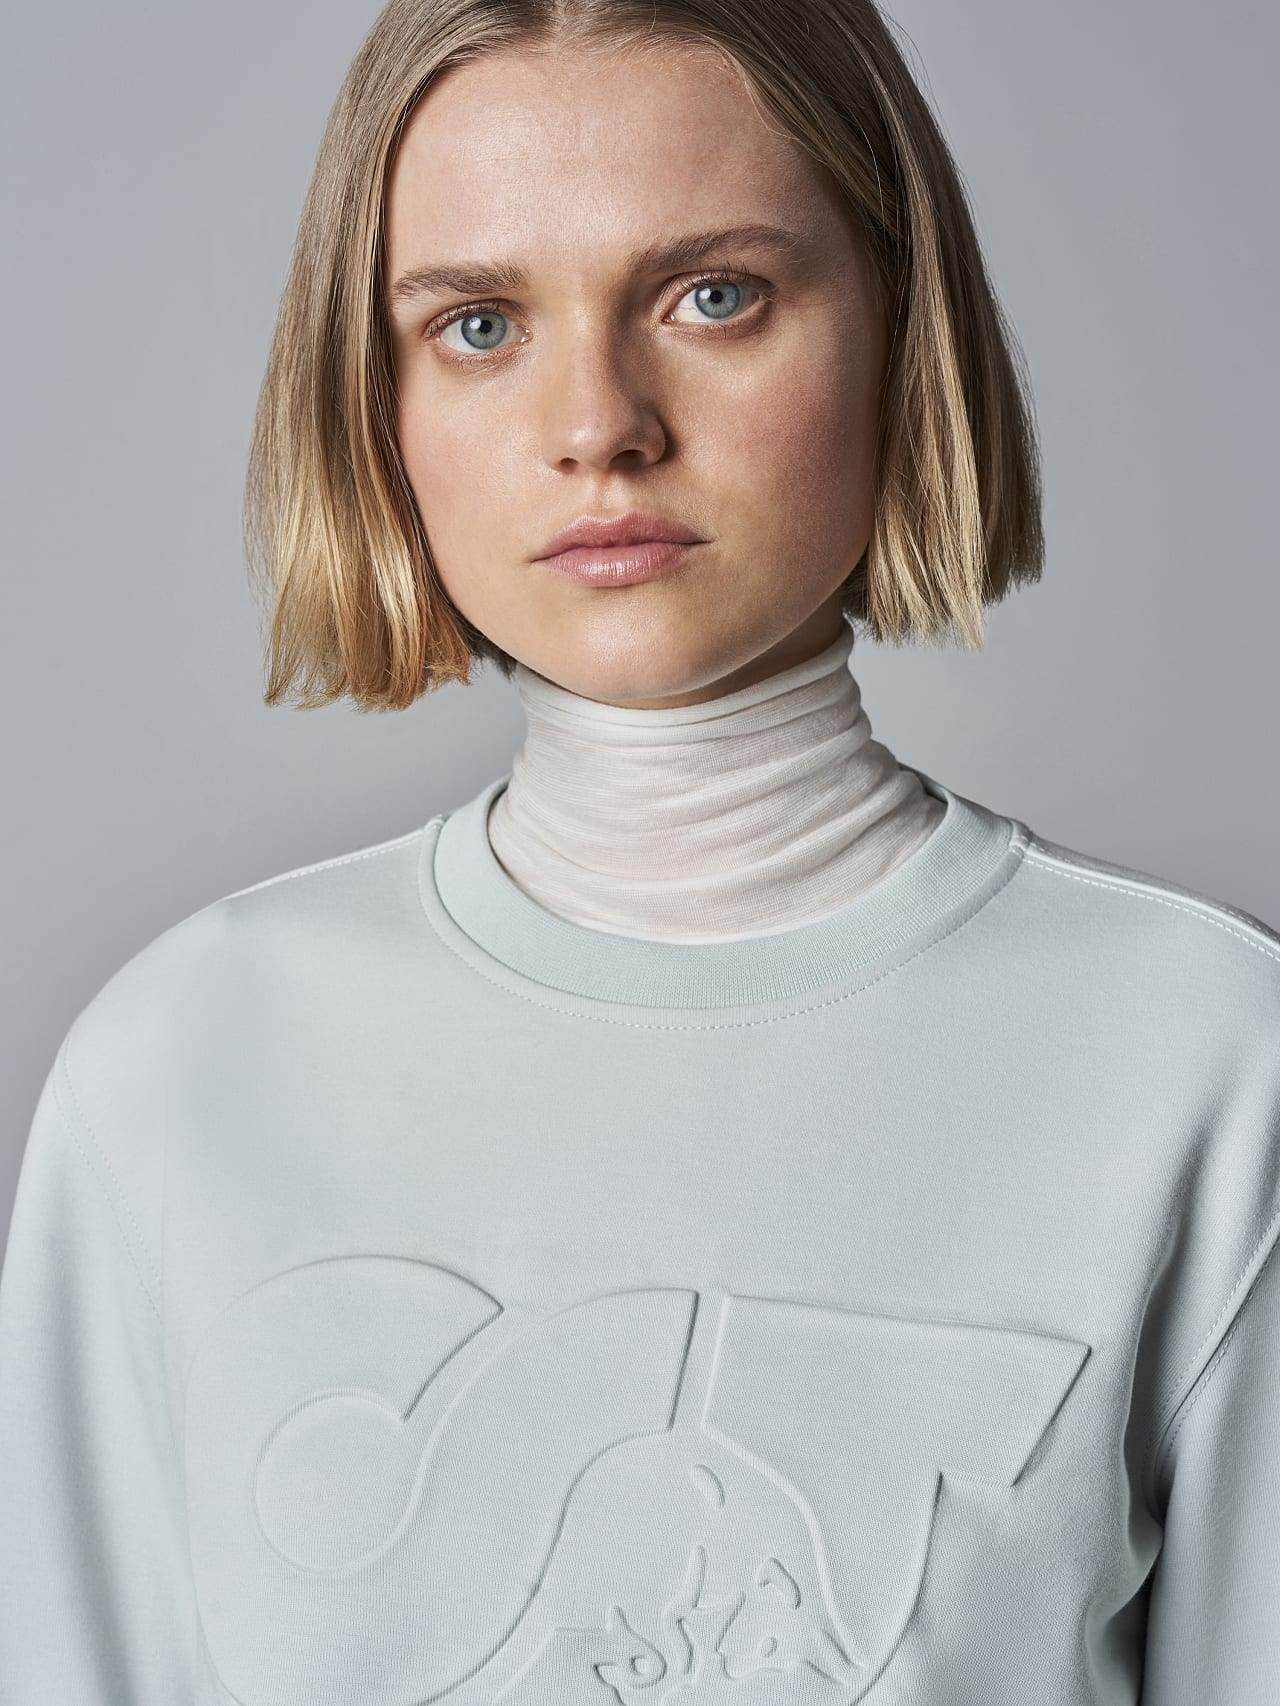 SHINT V1.Y5.02 Premium Logo Sweater Pale Blue  Right Alpha Tauri